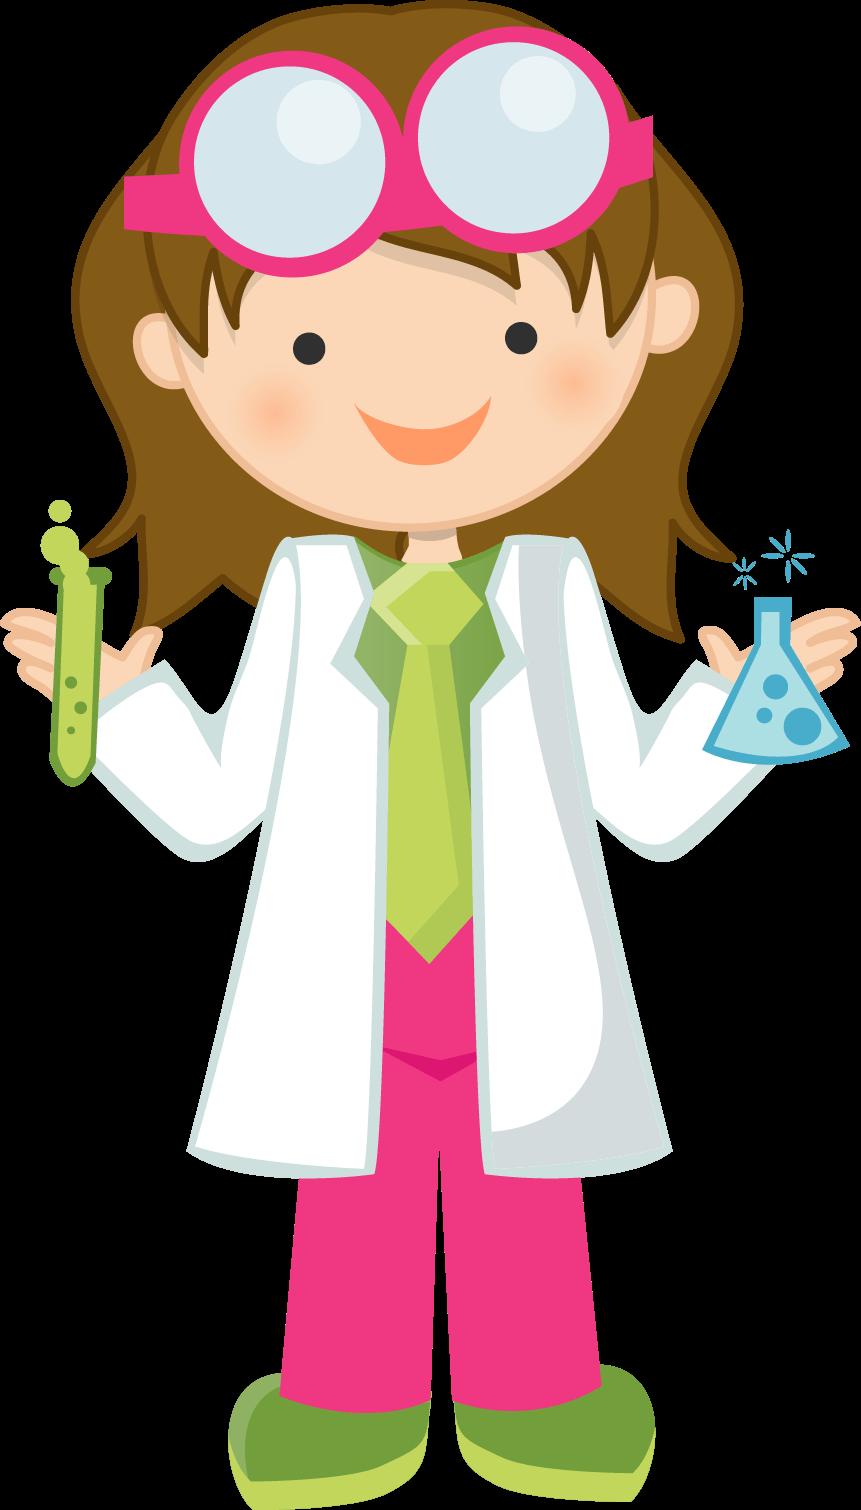 Cute science clipart for teachers.